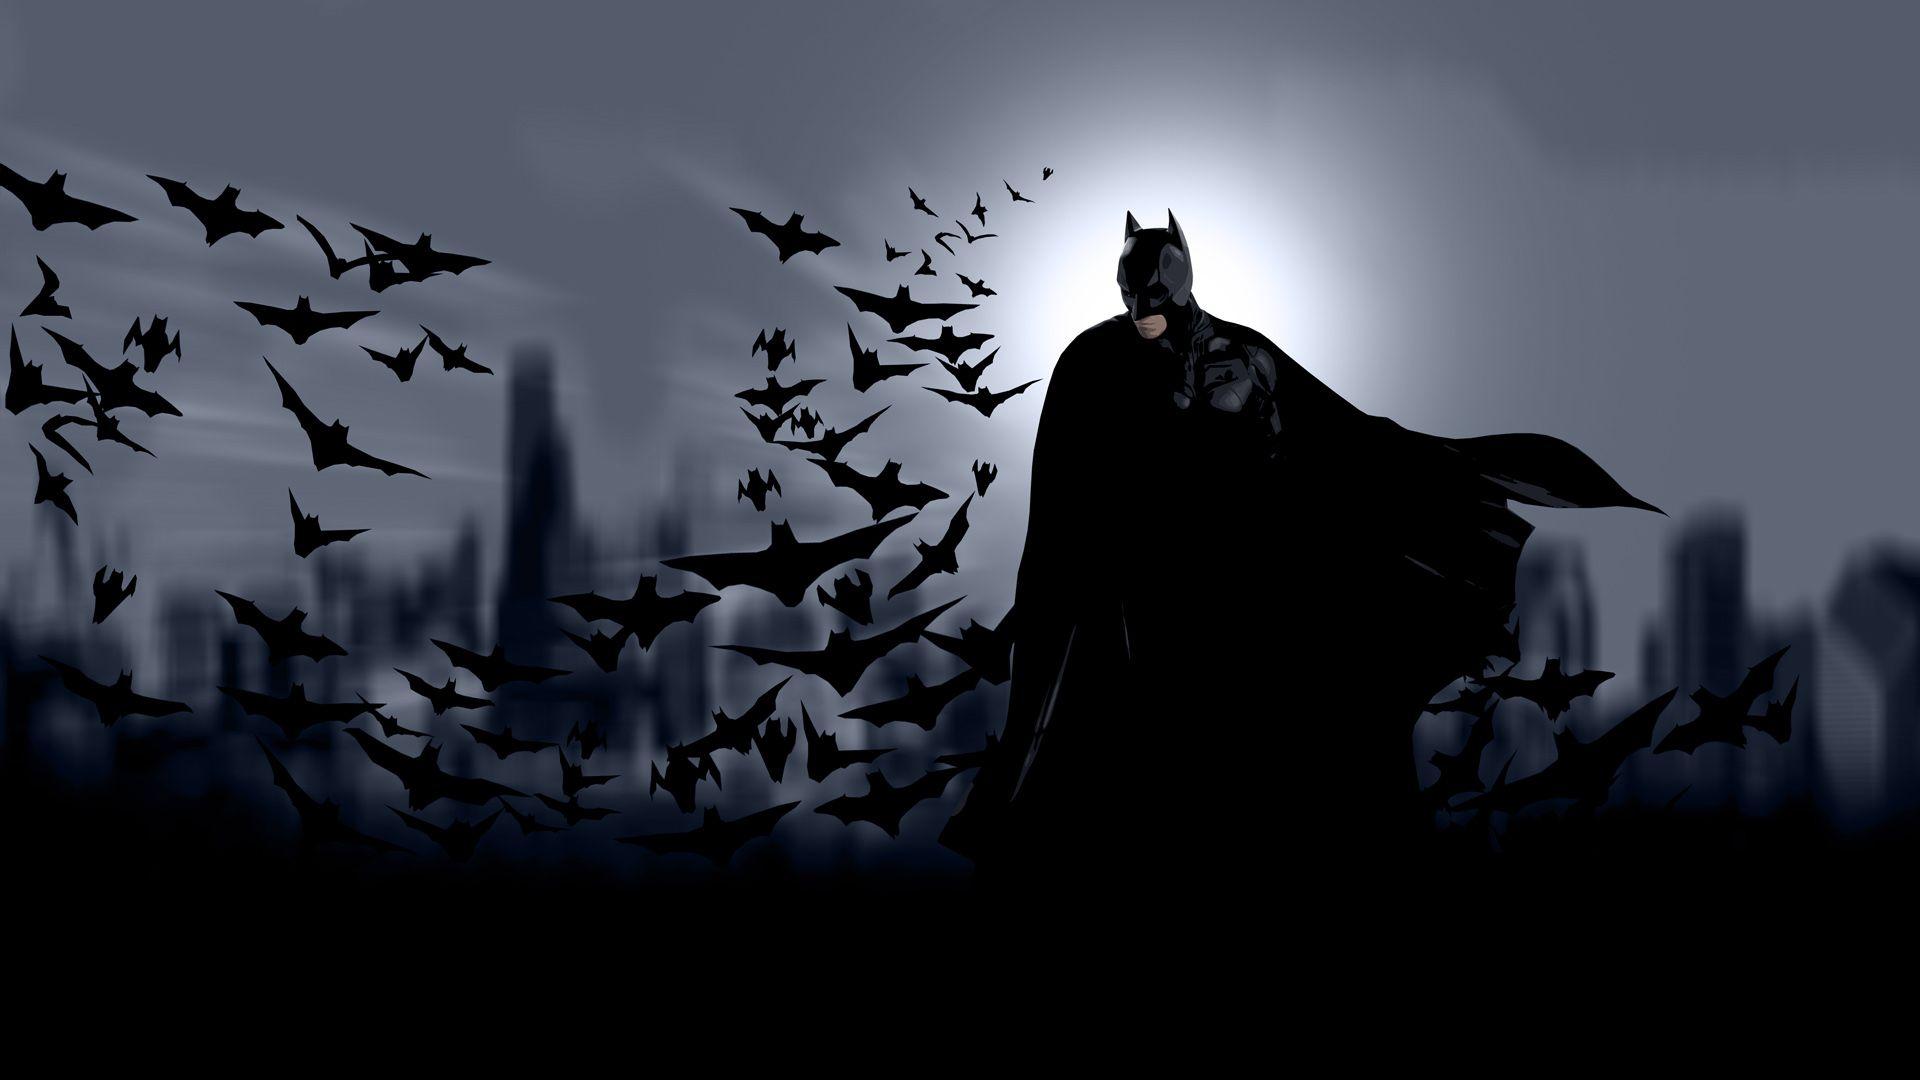 Batman Wallpaper 4k Background